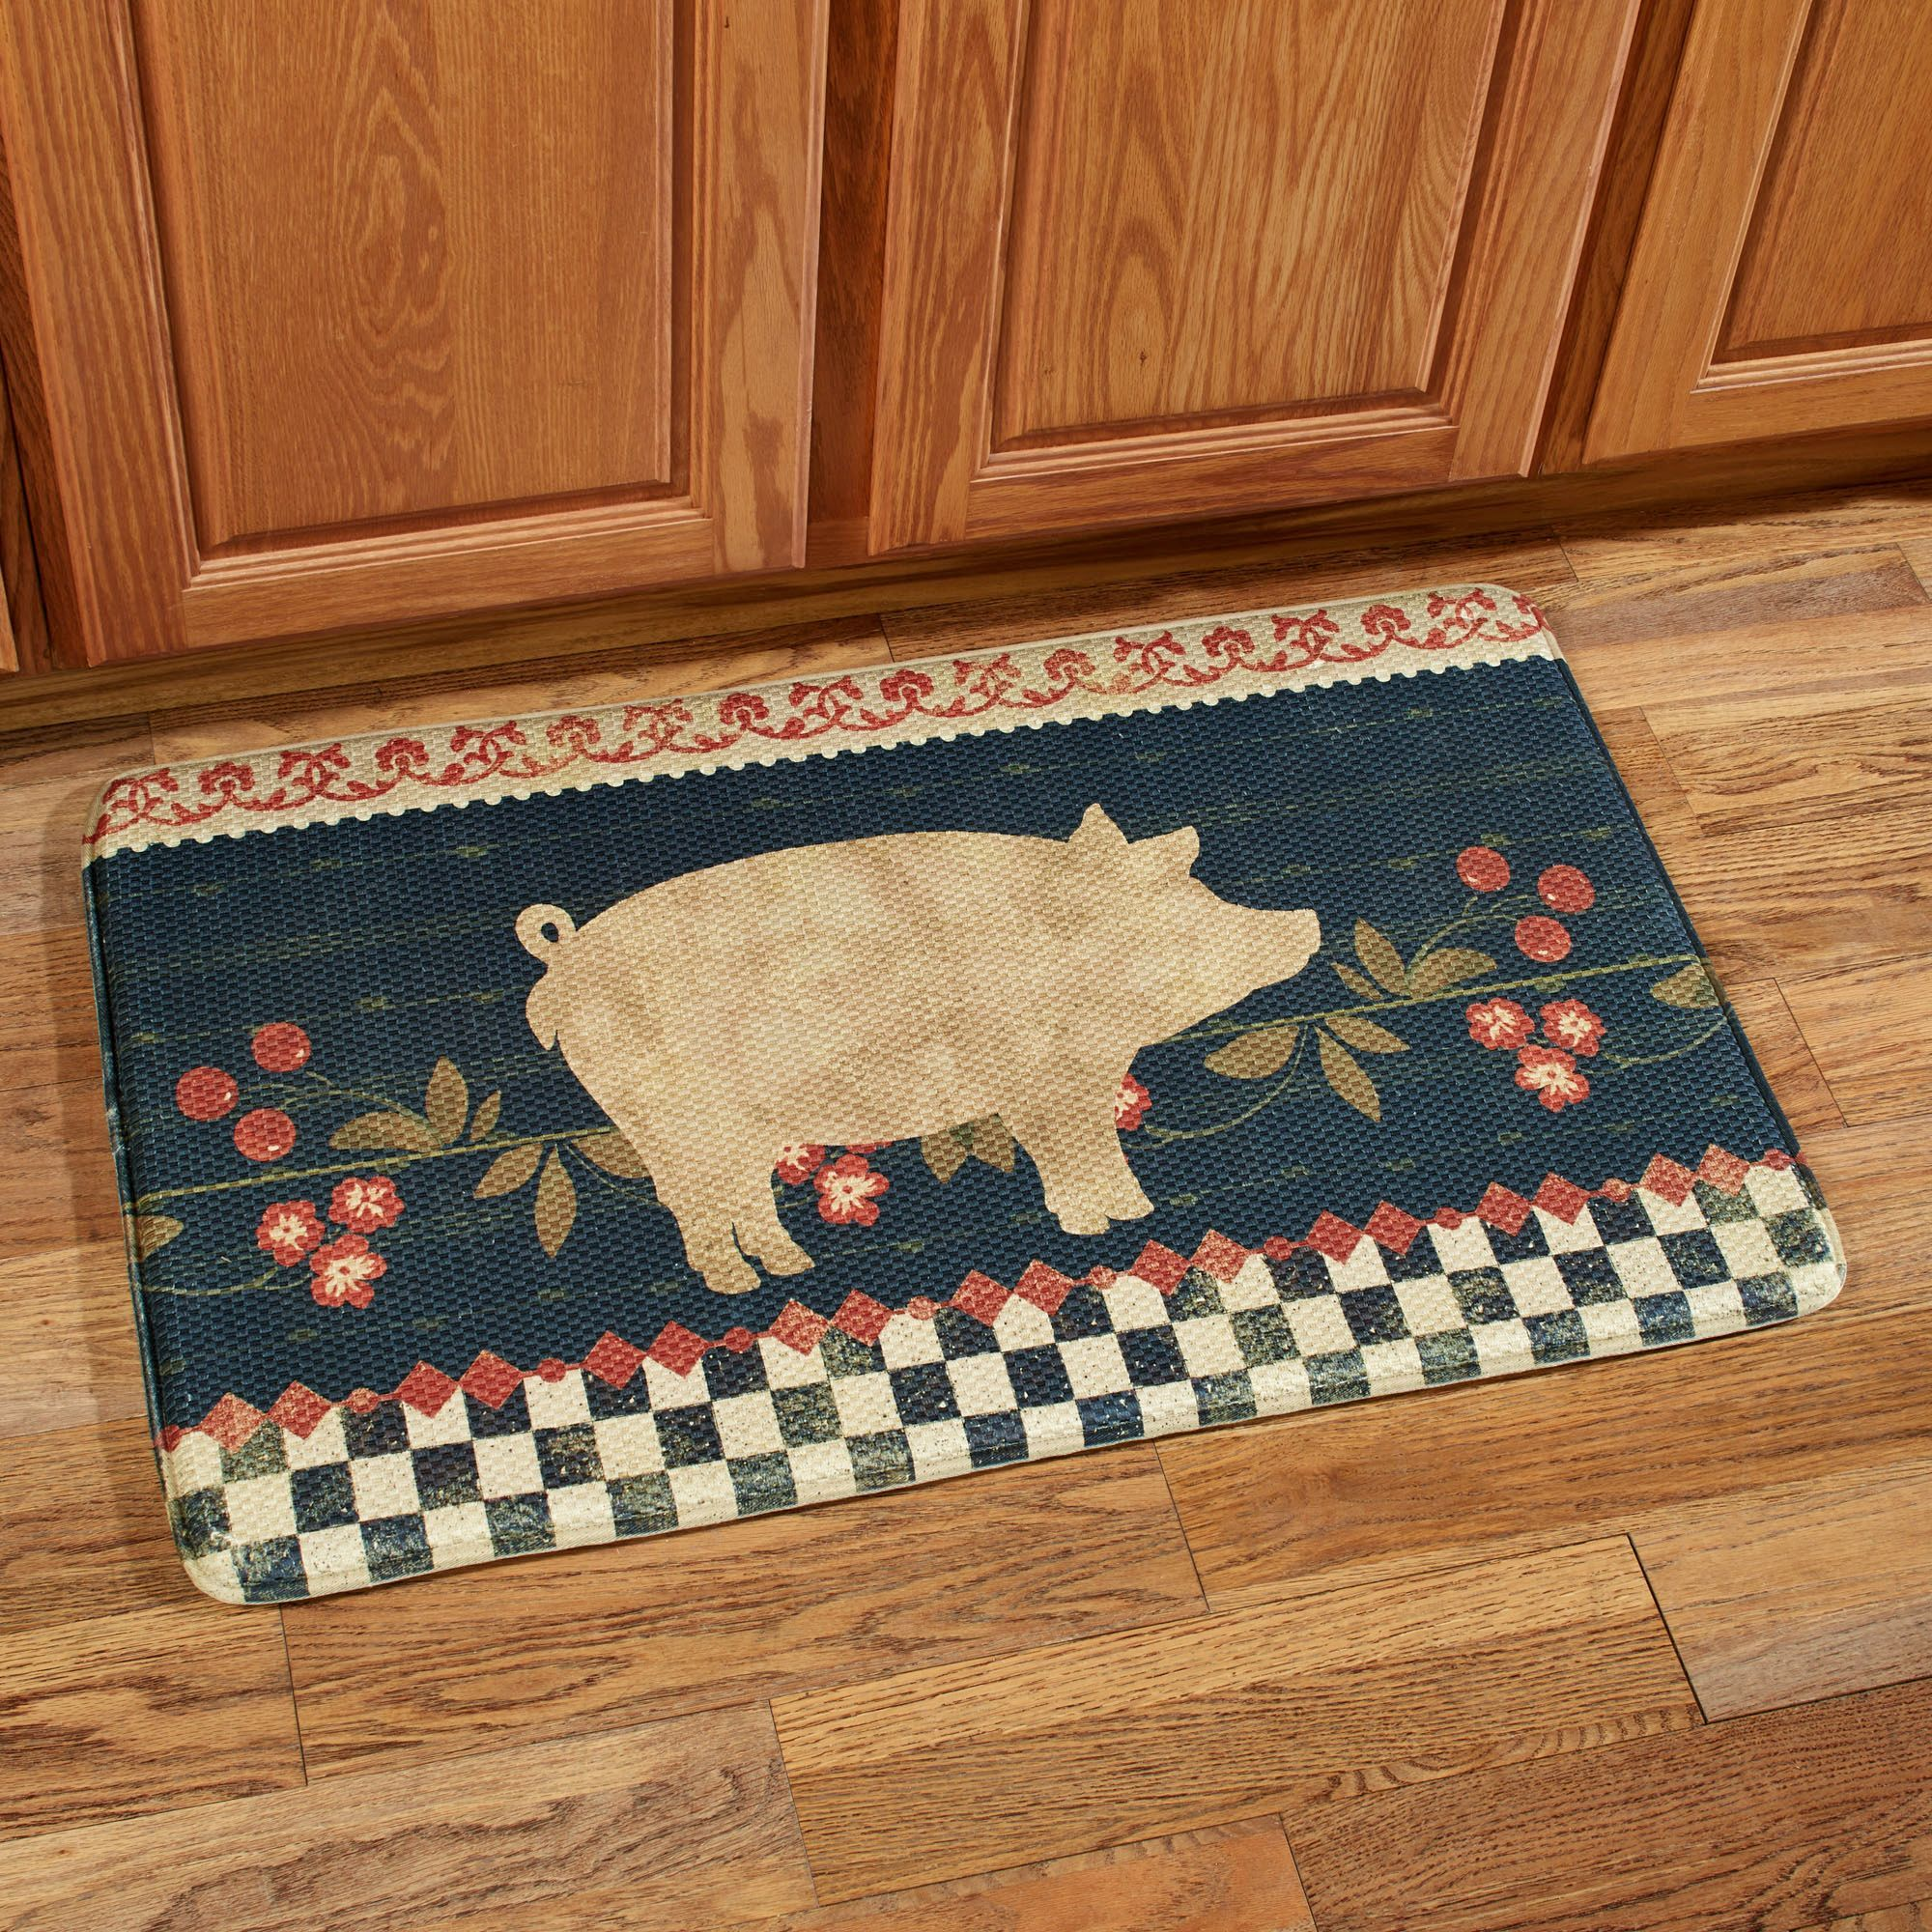 post door me w your remove resolutions home couple doormat retina entrance shoes mat floor h please mesmerizing pig x mats for videowat doormatmesmerizing wide